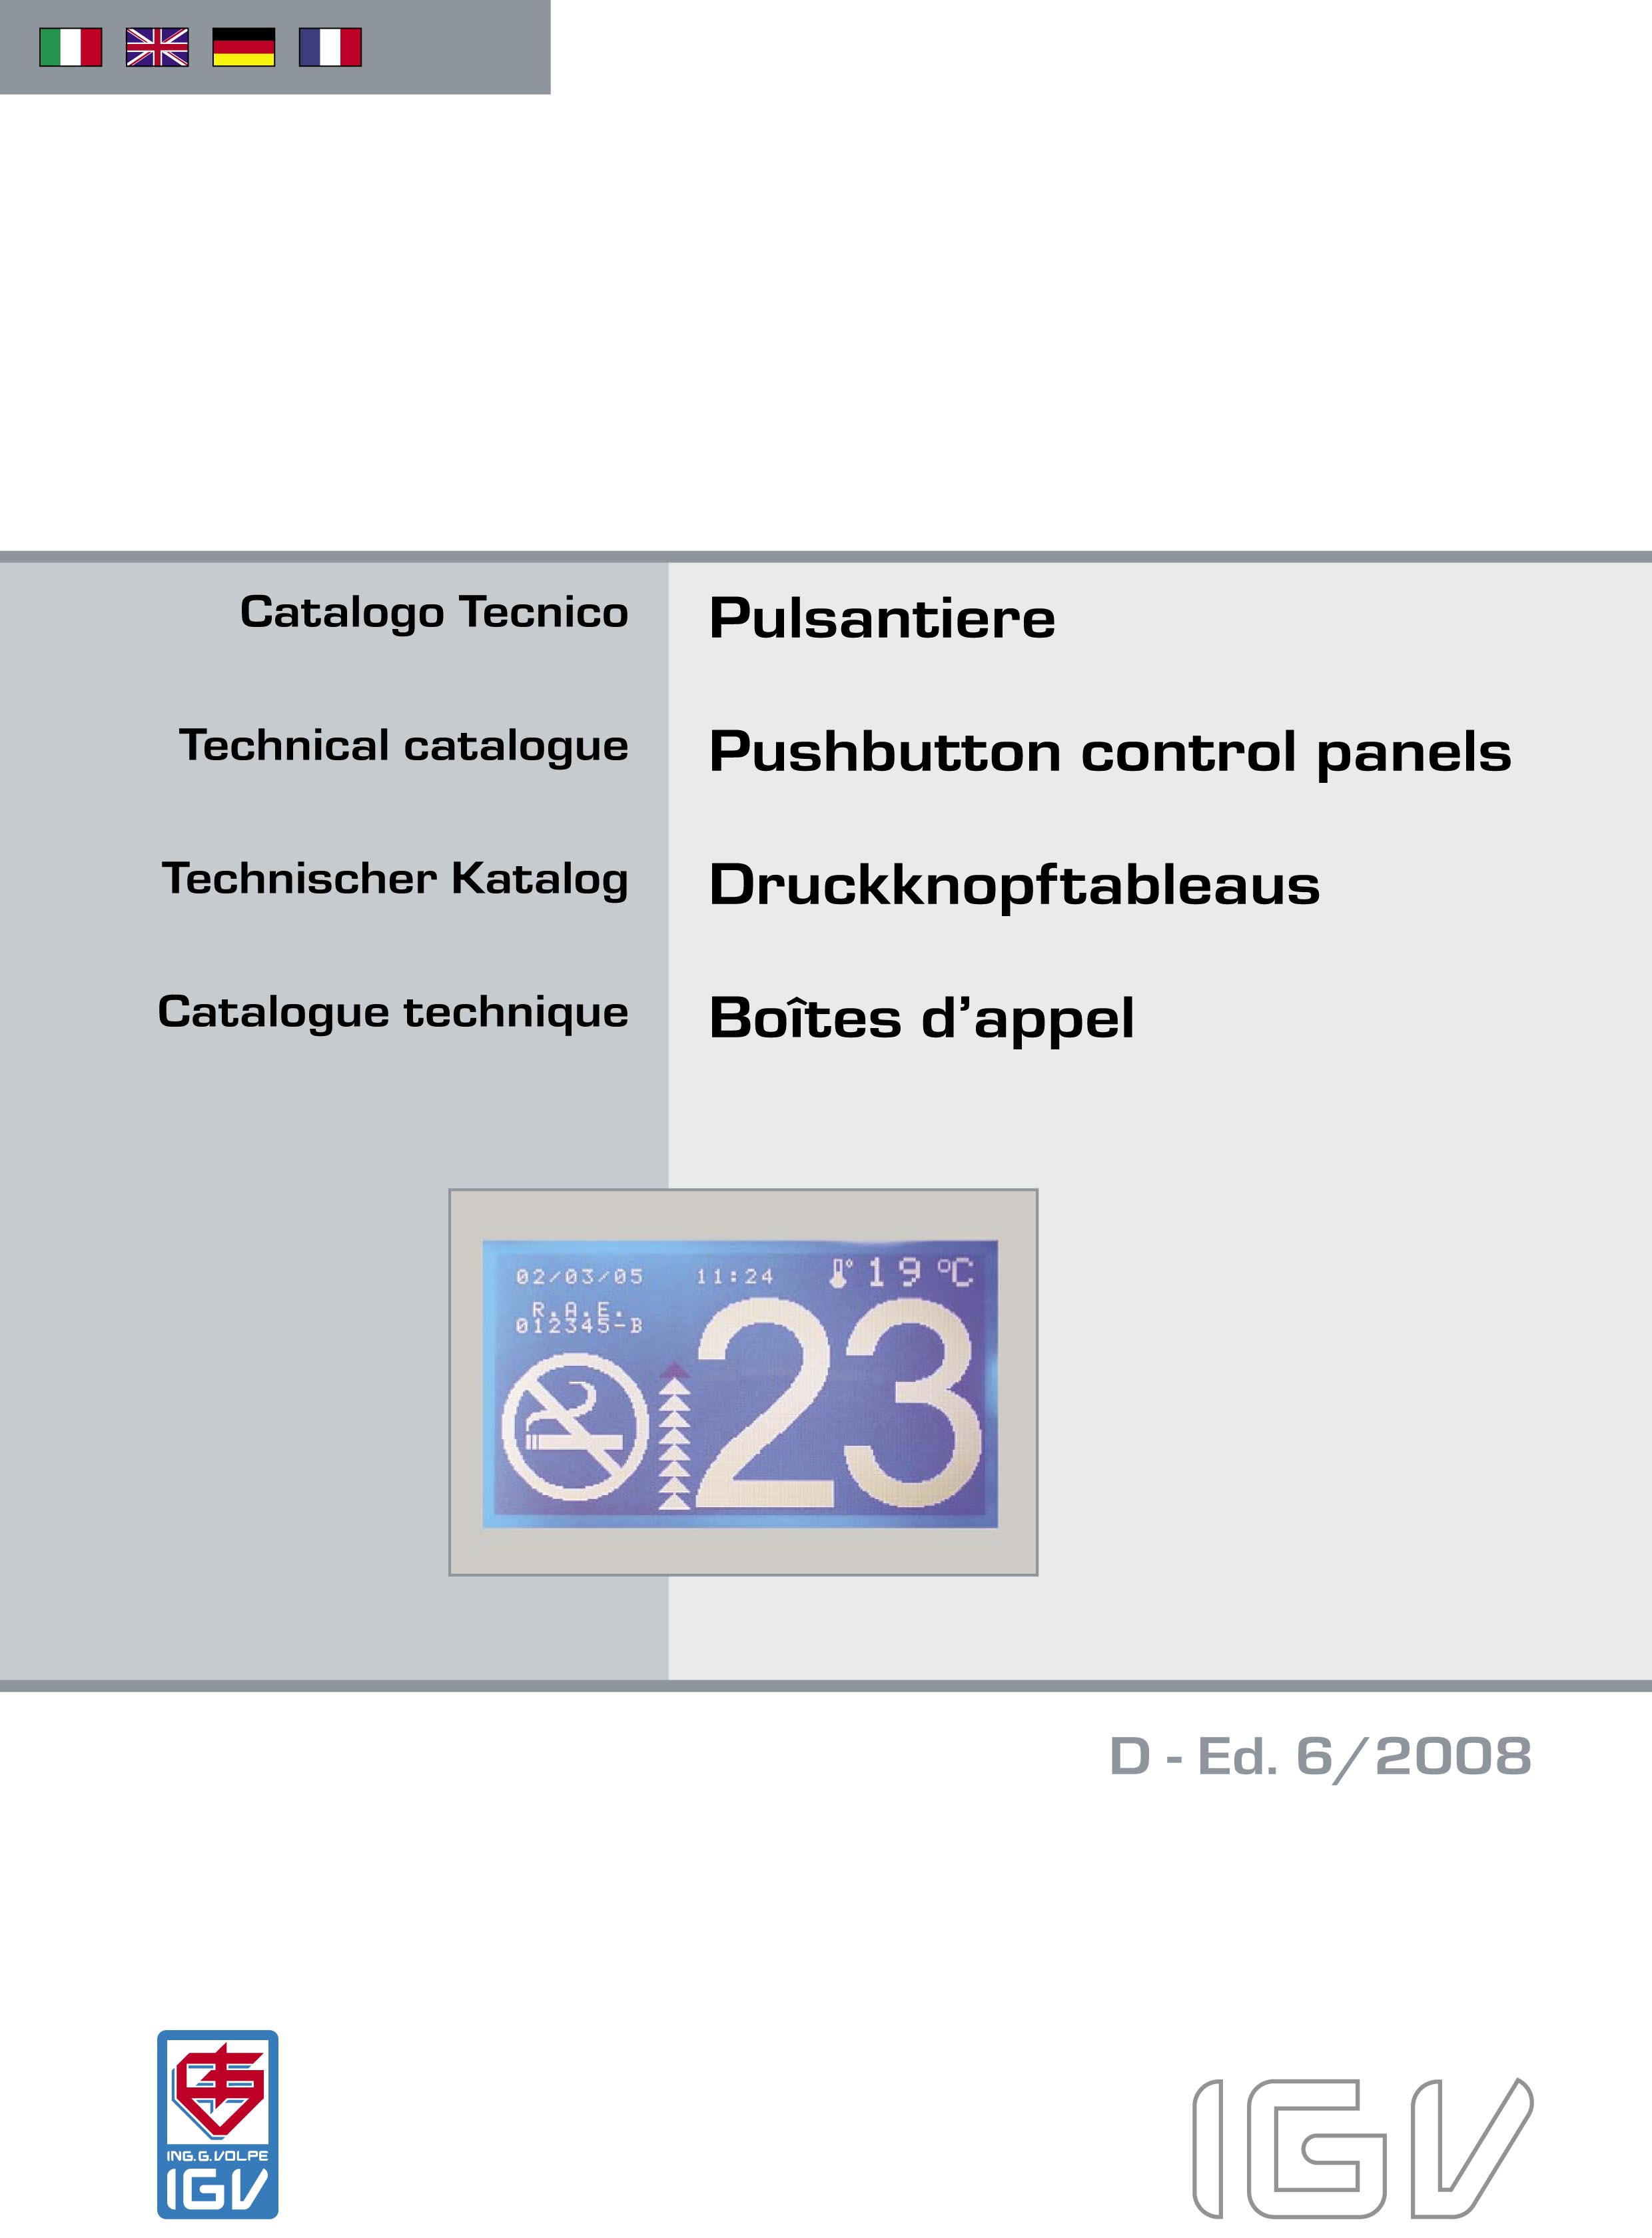 Microsoft Word - catald_06_08.doc